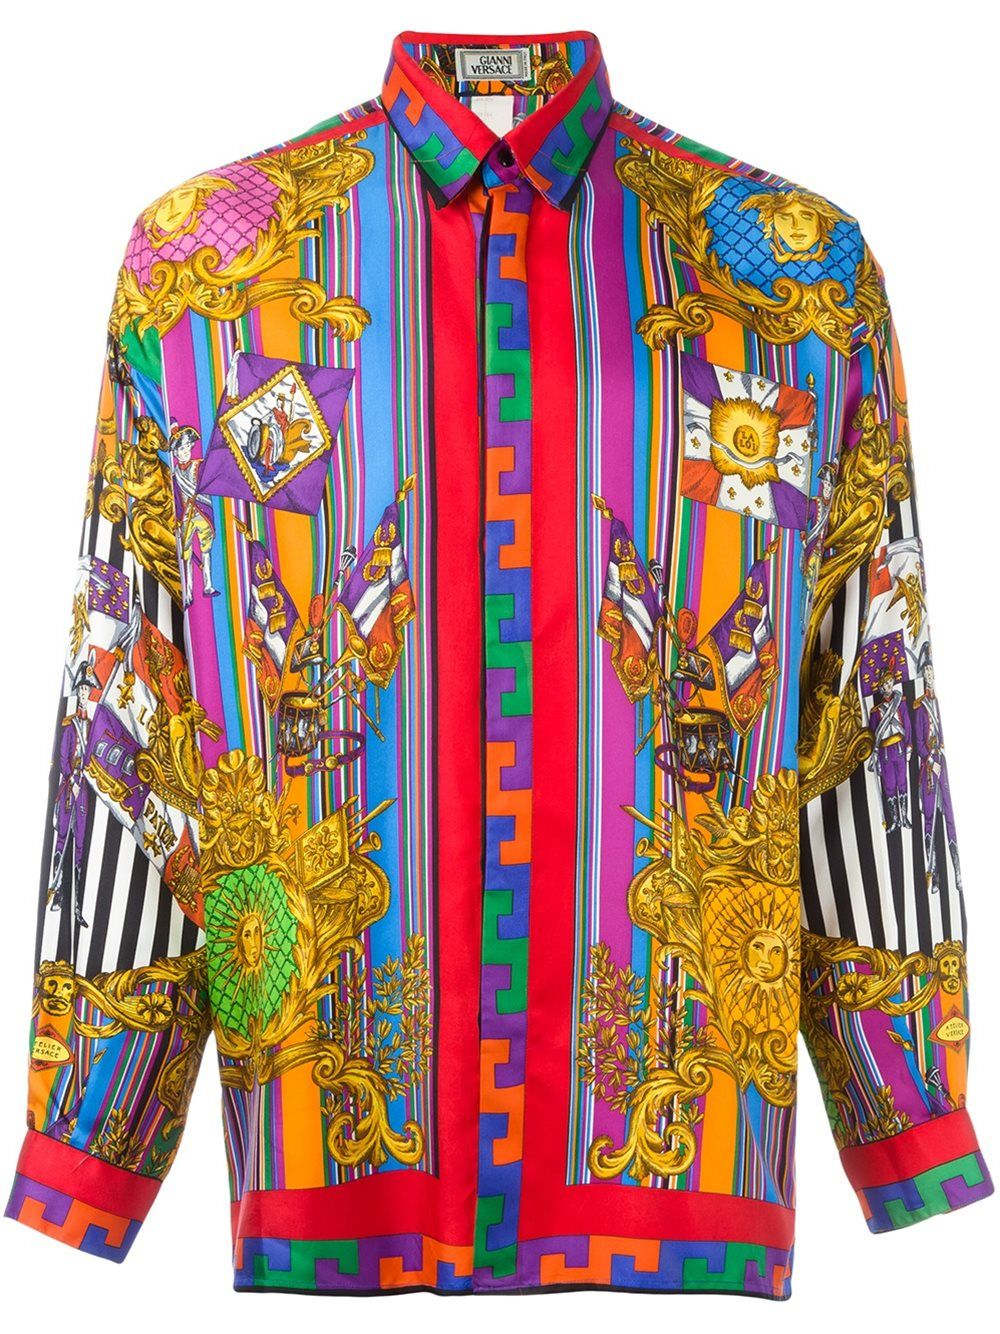 3571be620c4811 Versace Vintage printed shirt | Versace✨ in 2019 | Versace shirts ...